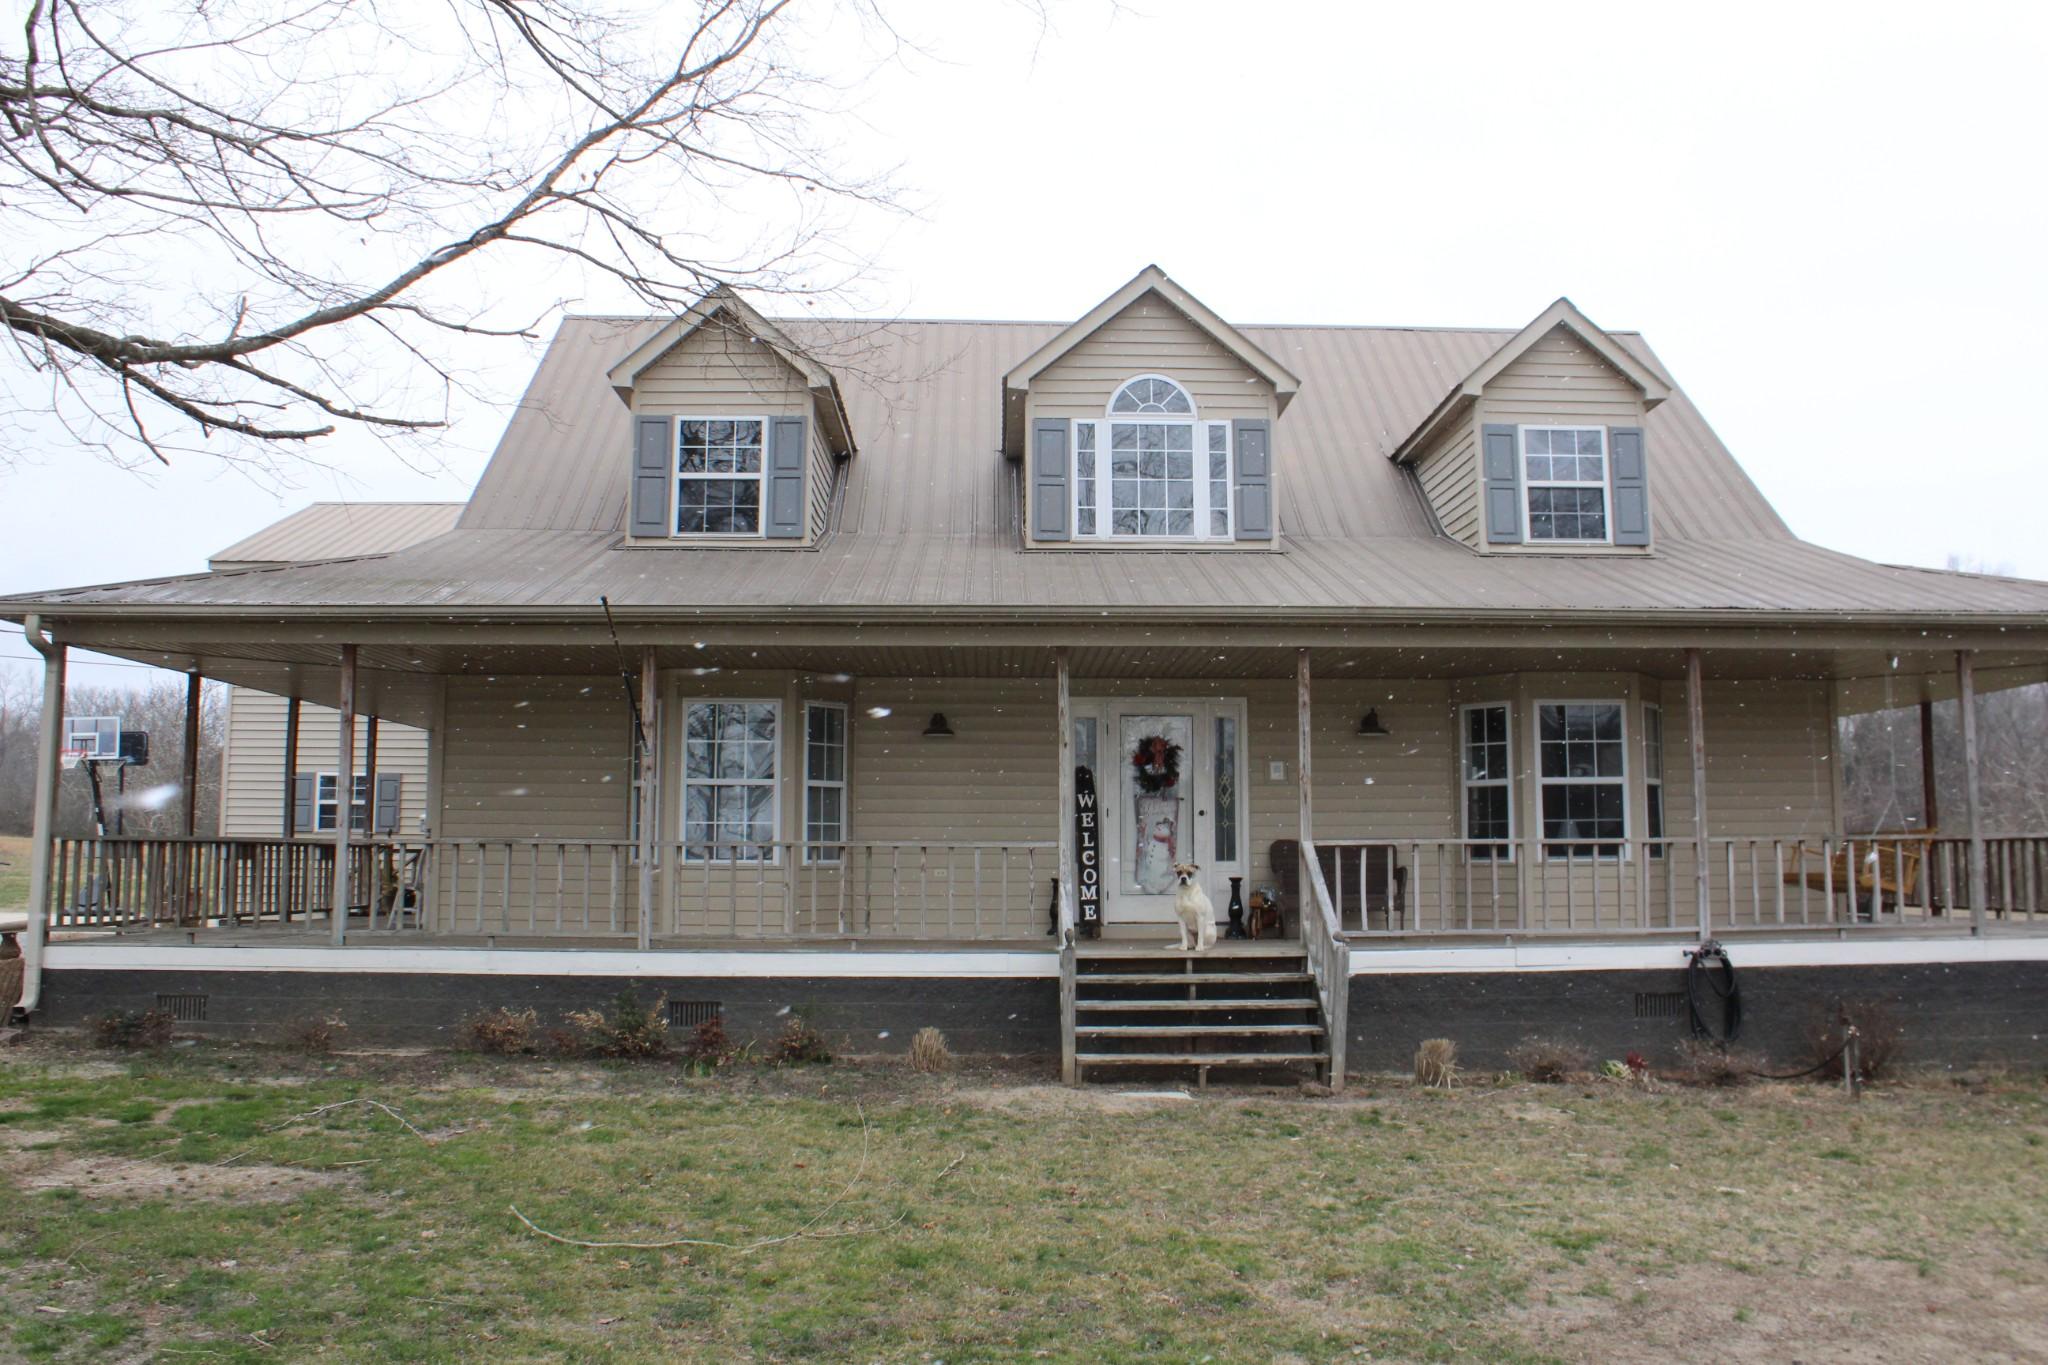 488 Dr Fisher Rd, Mc Minnville, TN 37110 - Mc Minnville, TN real estate listing